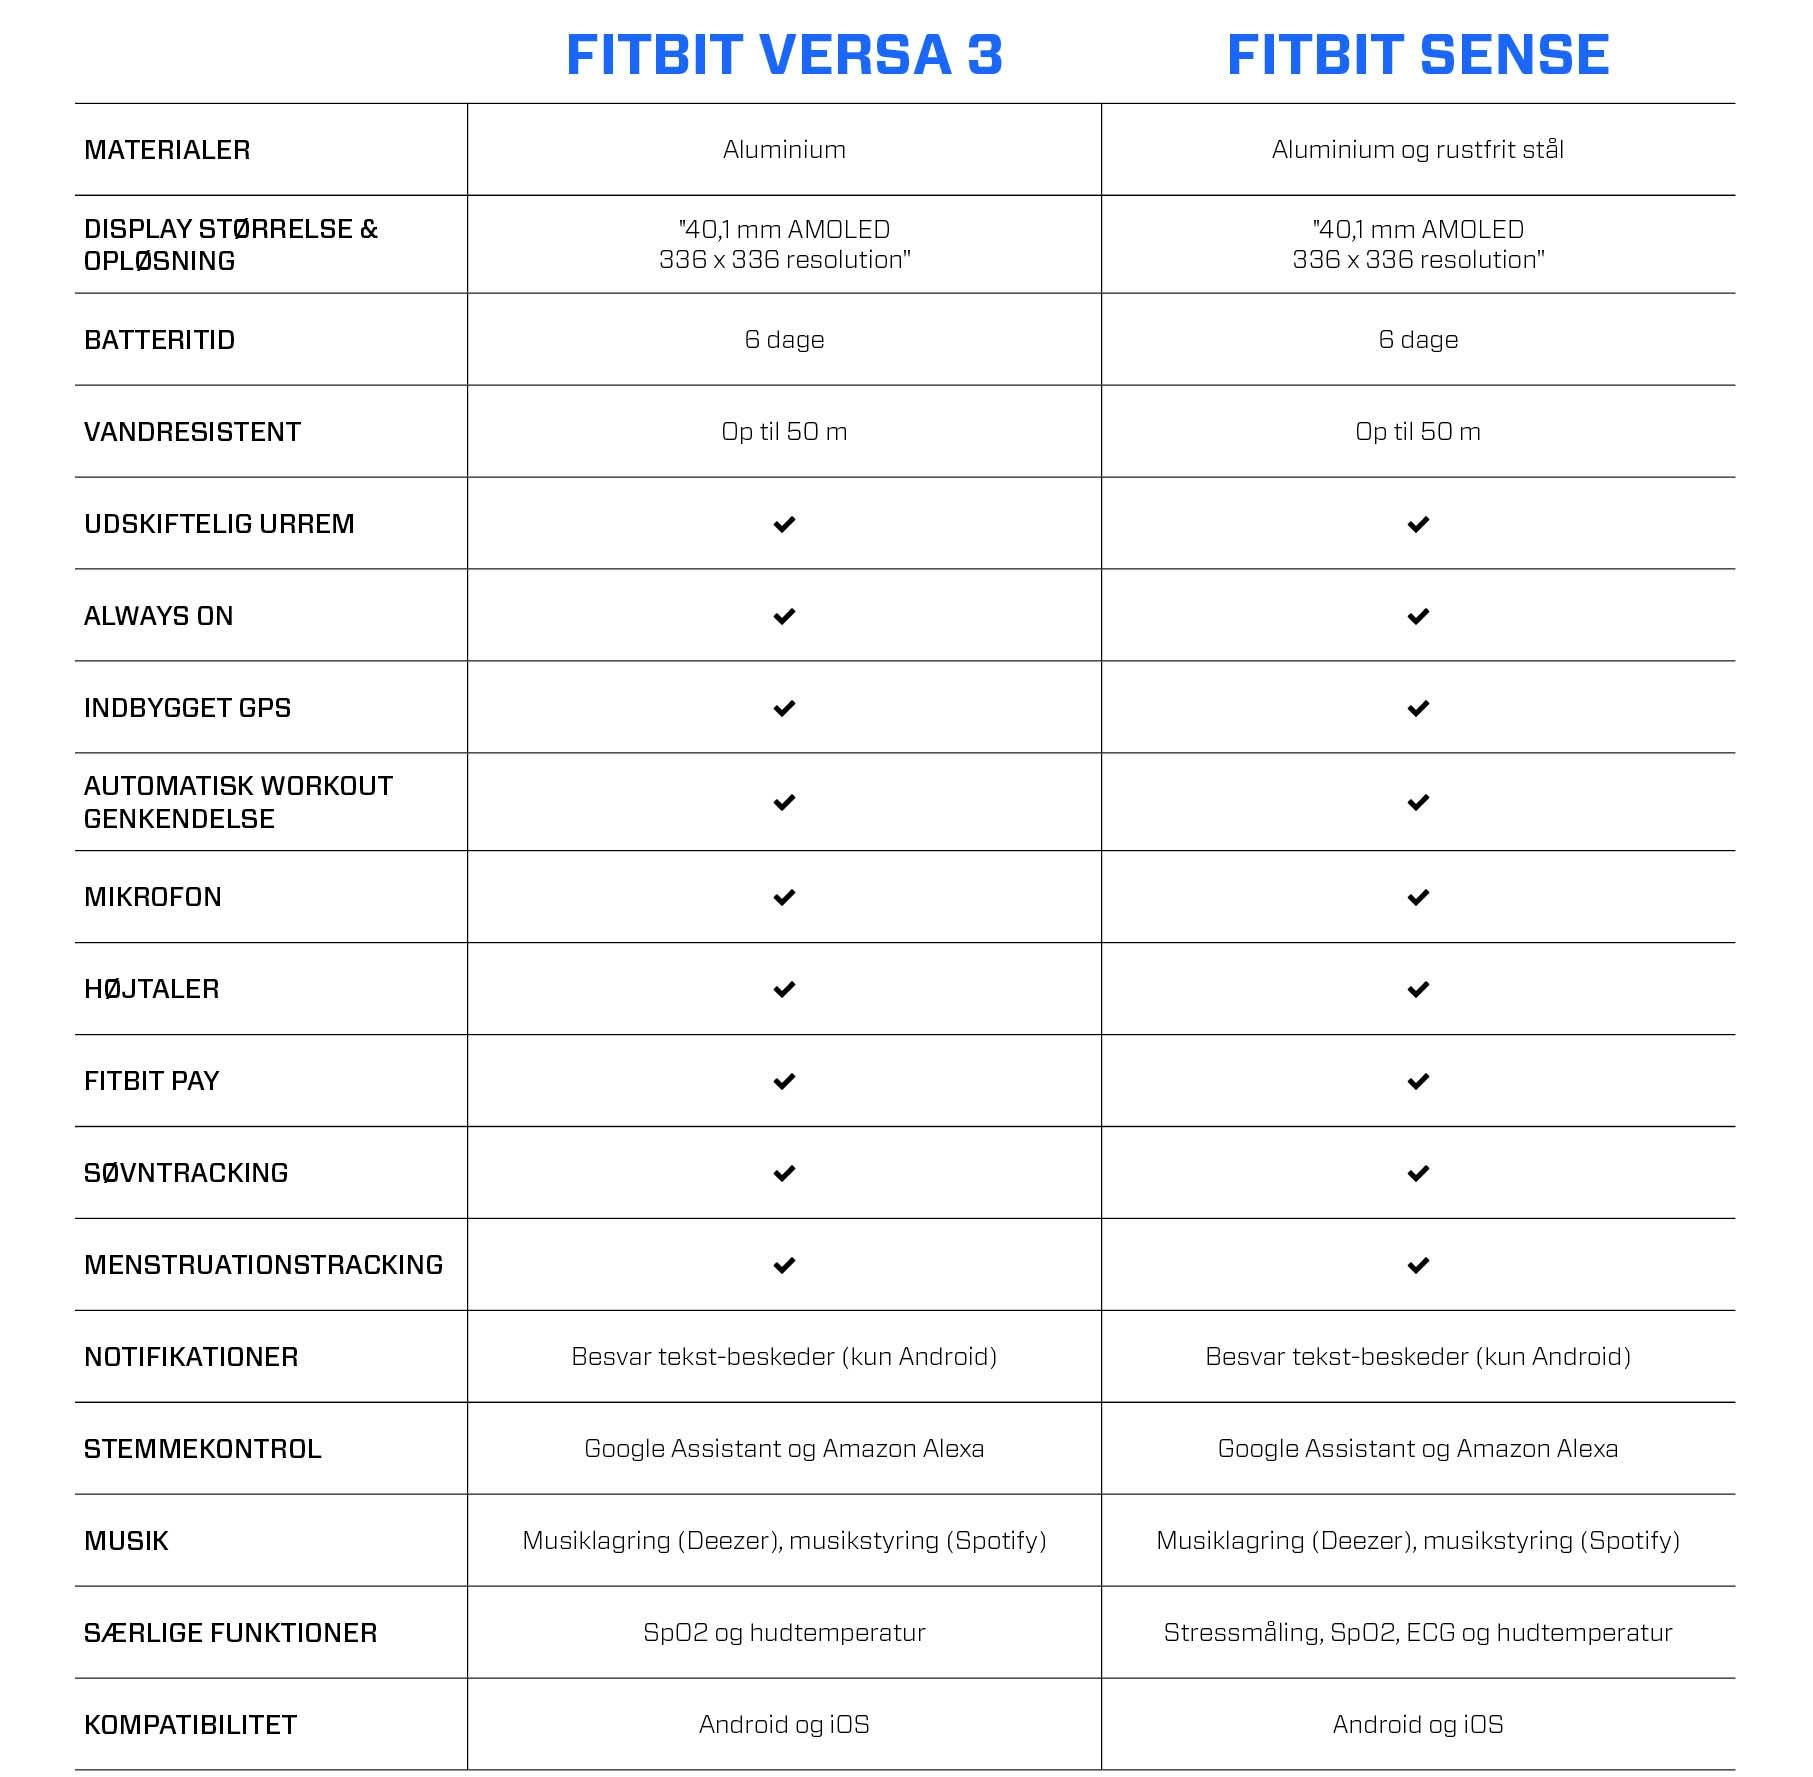 fitbit versa 3 vs fitbit sense